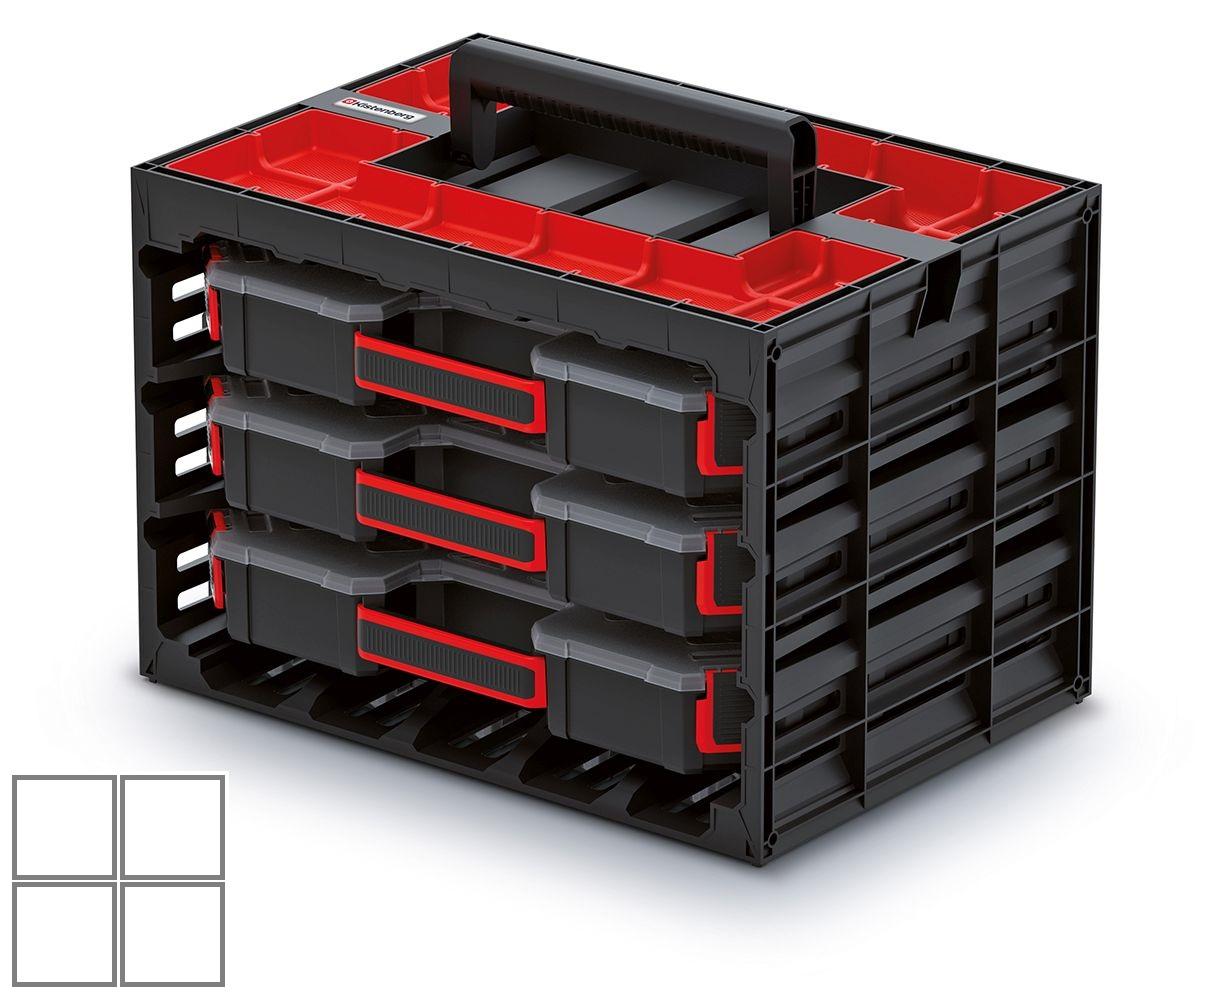 PROSPERPLAST Skříňka s 3 organizéry (krabičky) TAGER CASE 415x290x290